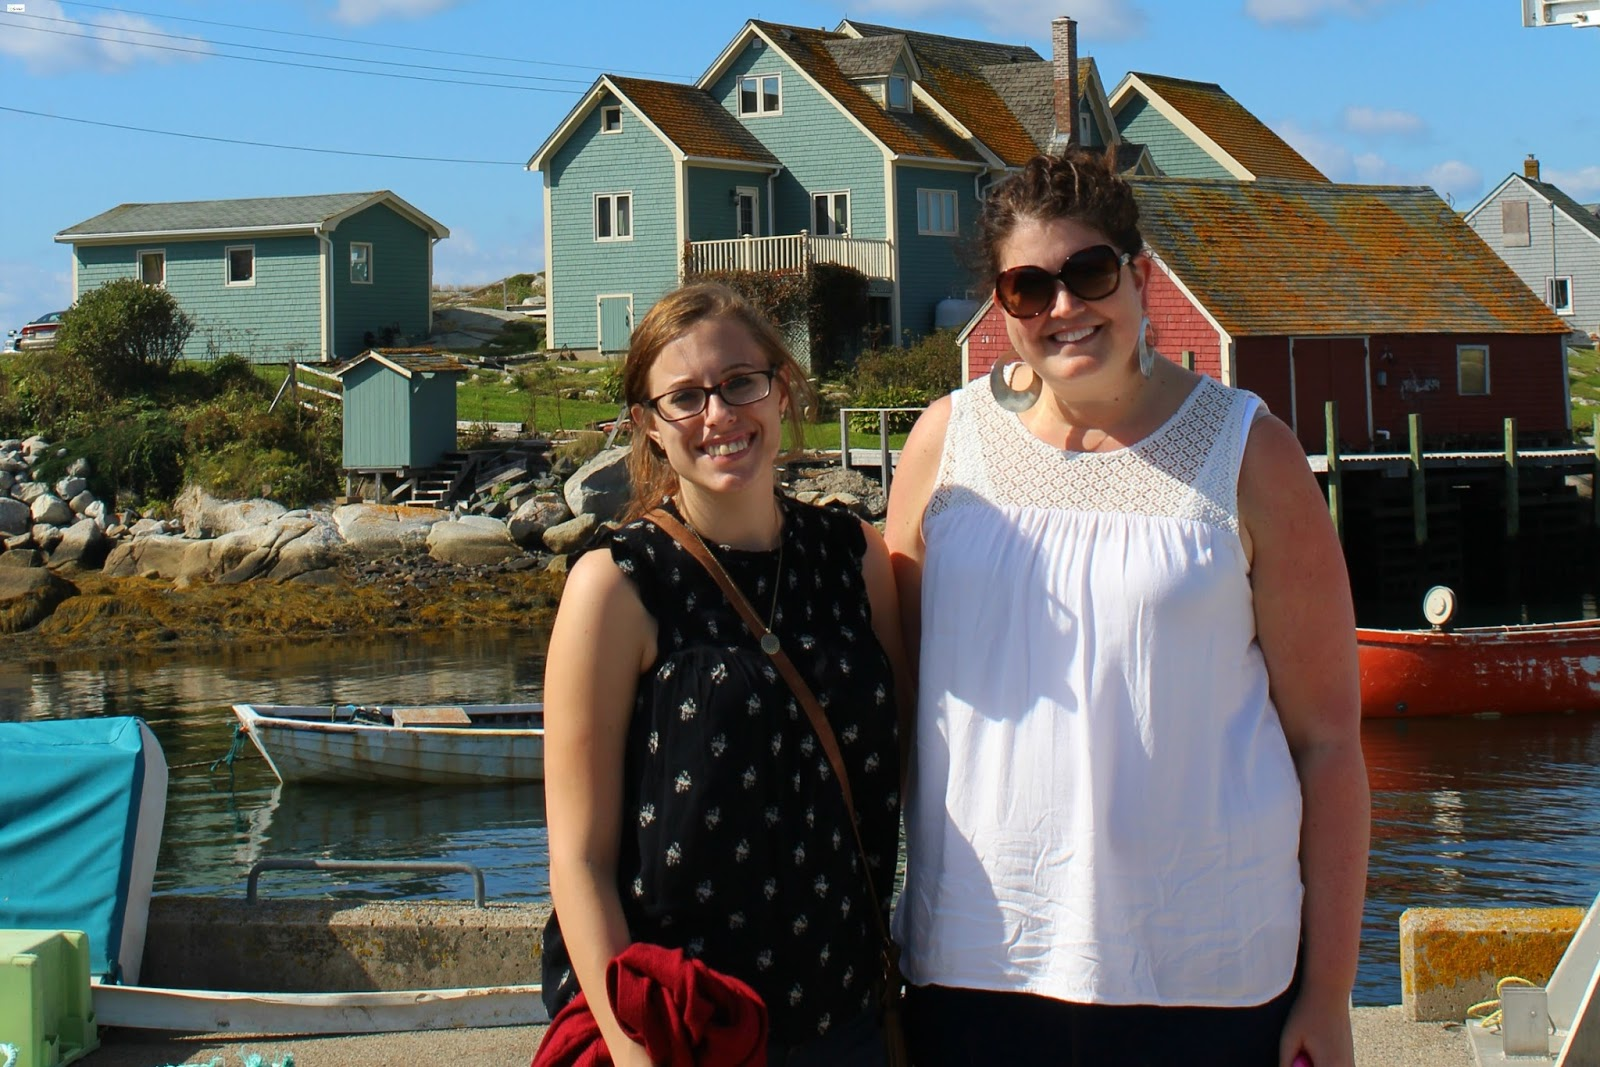 Caravan Sonnet Peggy S Cove Lighthouse Nova Scotia Canada